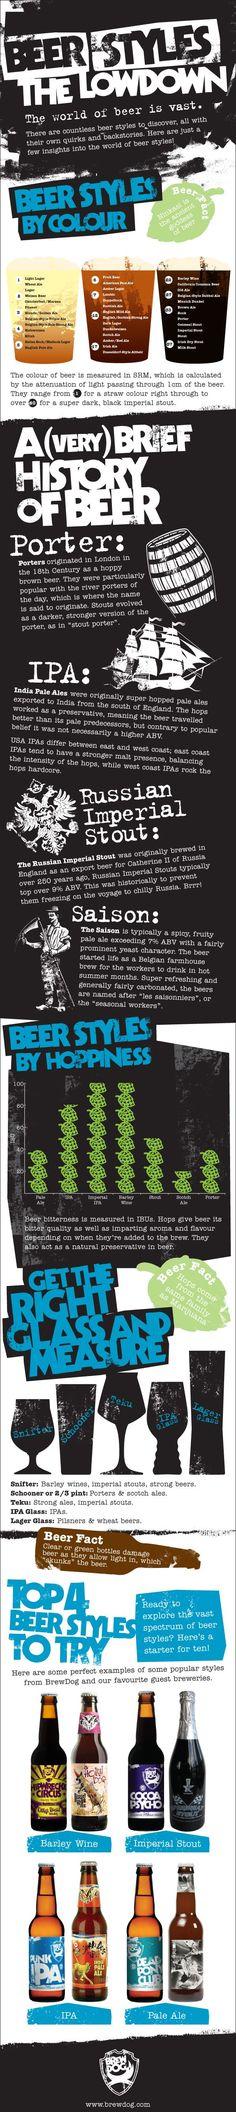 #craftbeer styles & history of beer #infographic @LiquorListcom www.LiquorList.com #LiquorList